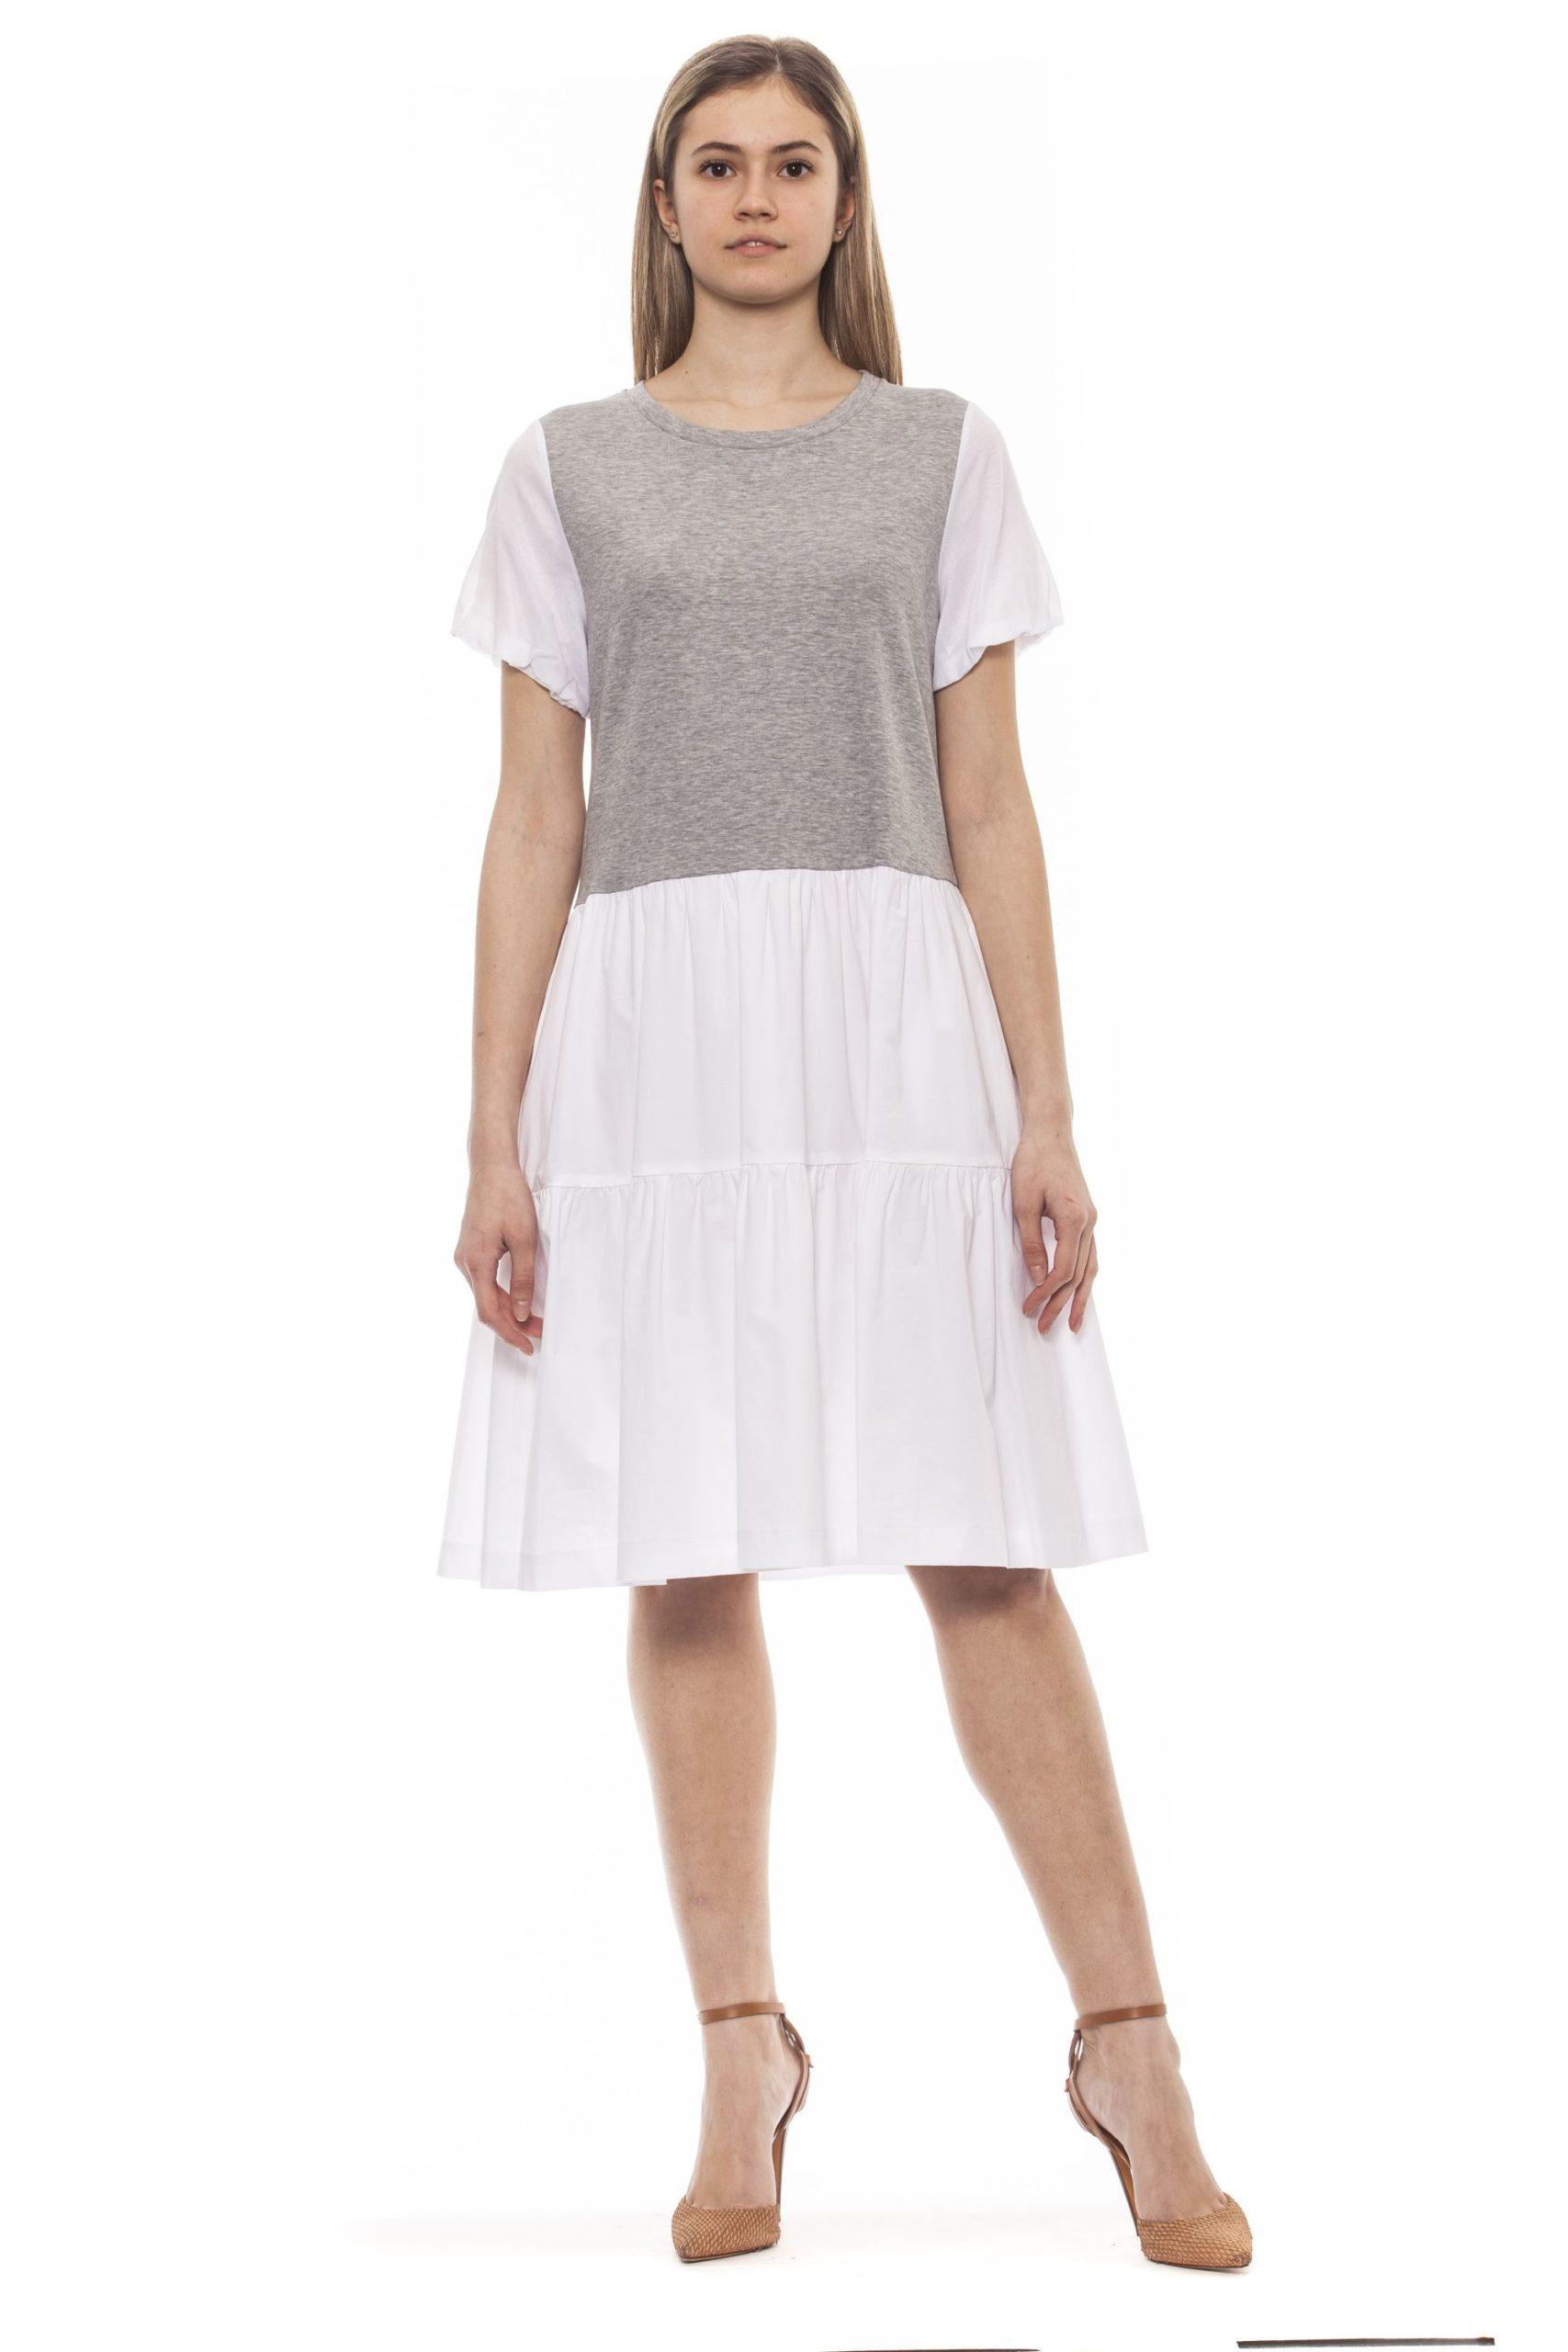 Peserico Women's Grigio Dress Gray PE1383198 - IT42 | S